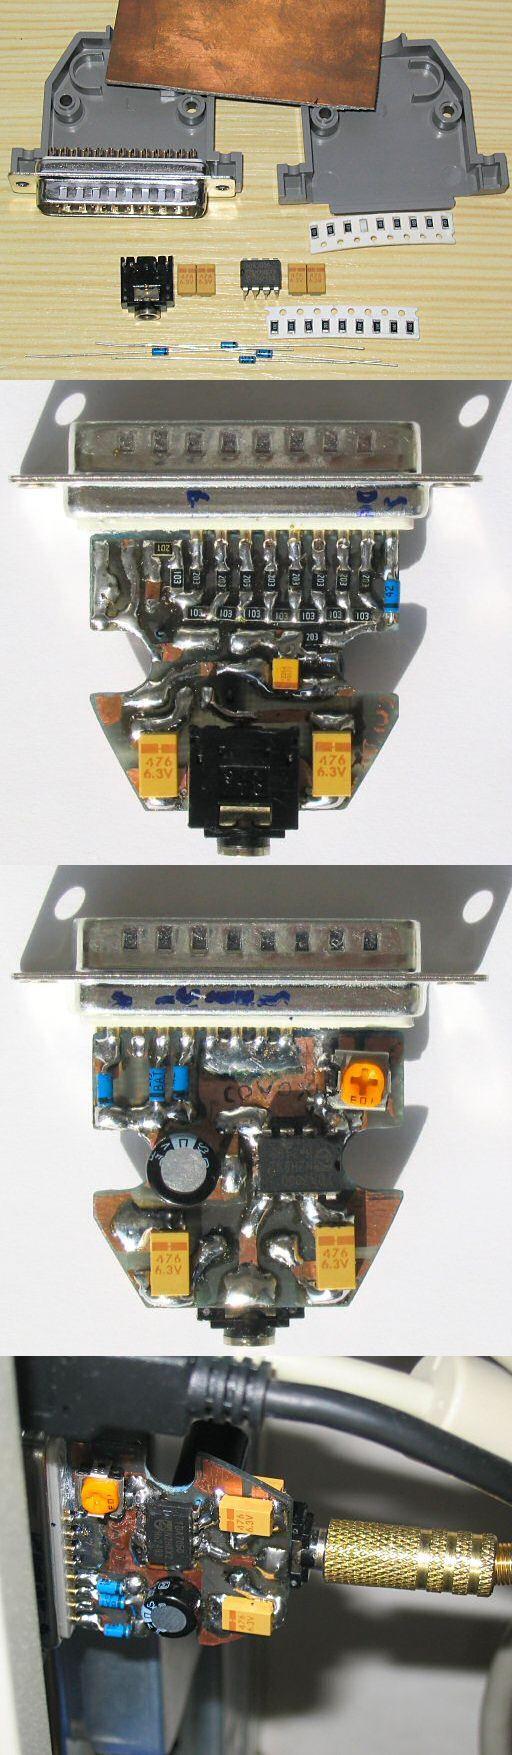 Parallel Port Interfacing Interesting Circuit